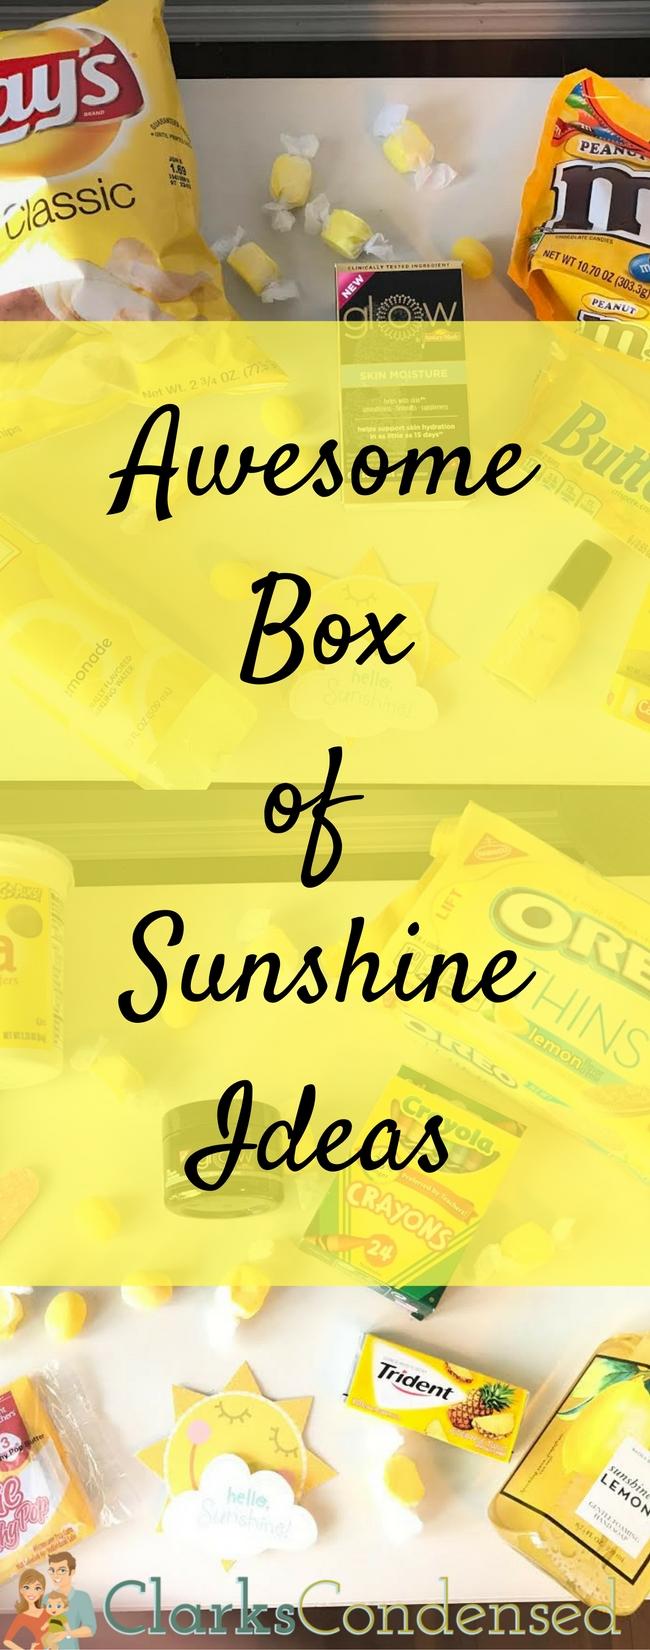 Box of Sunshine Ideas / Box of Sunshine / Sunshine Box Ideas / Care package ideas